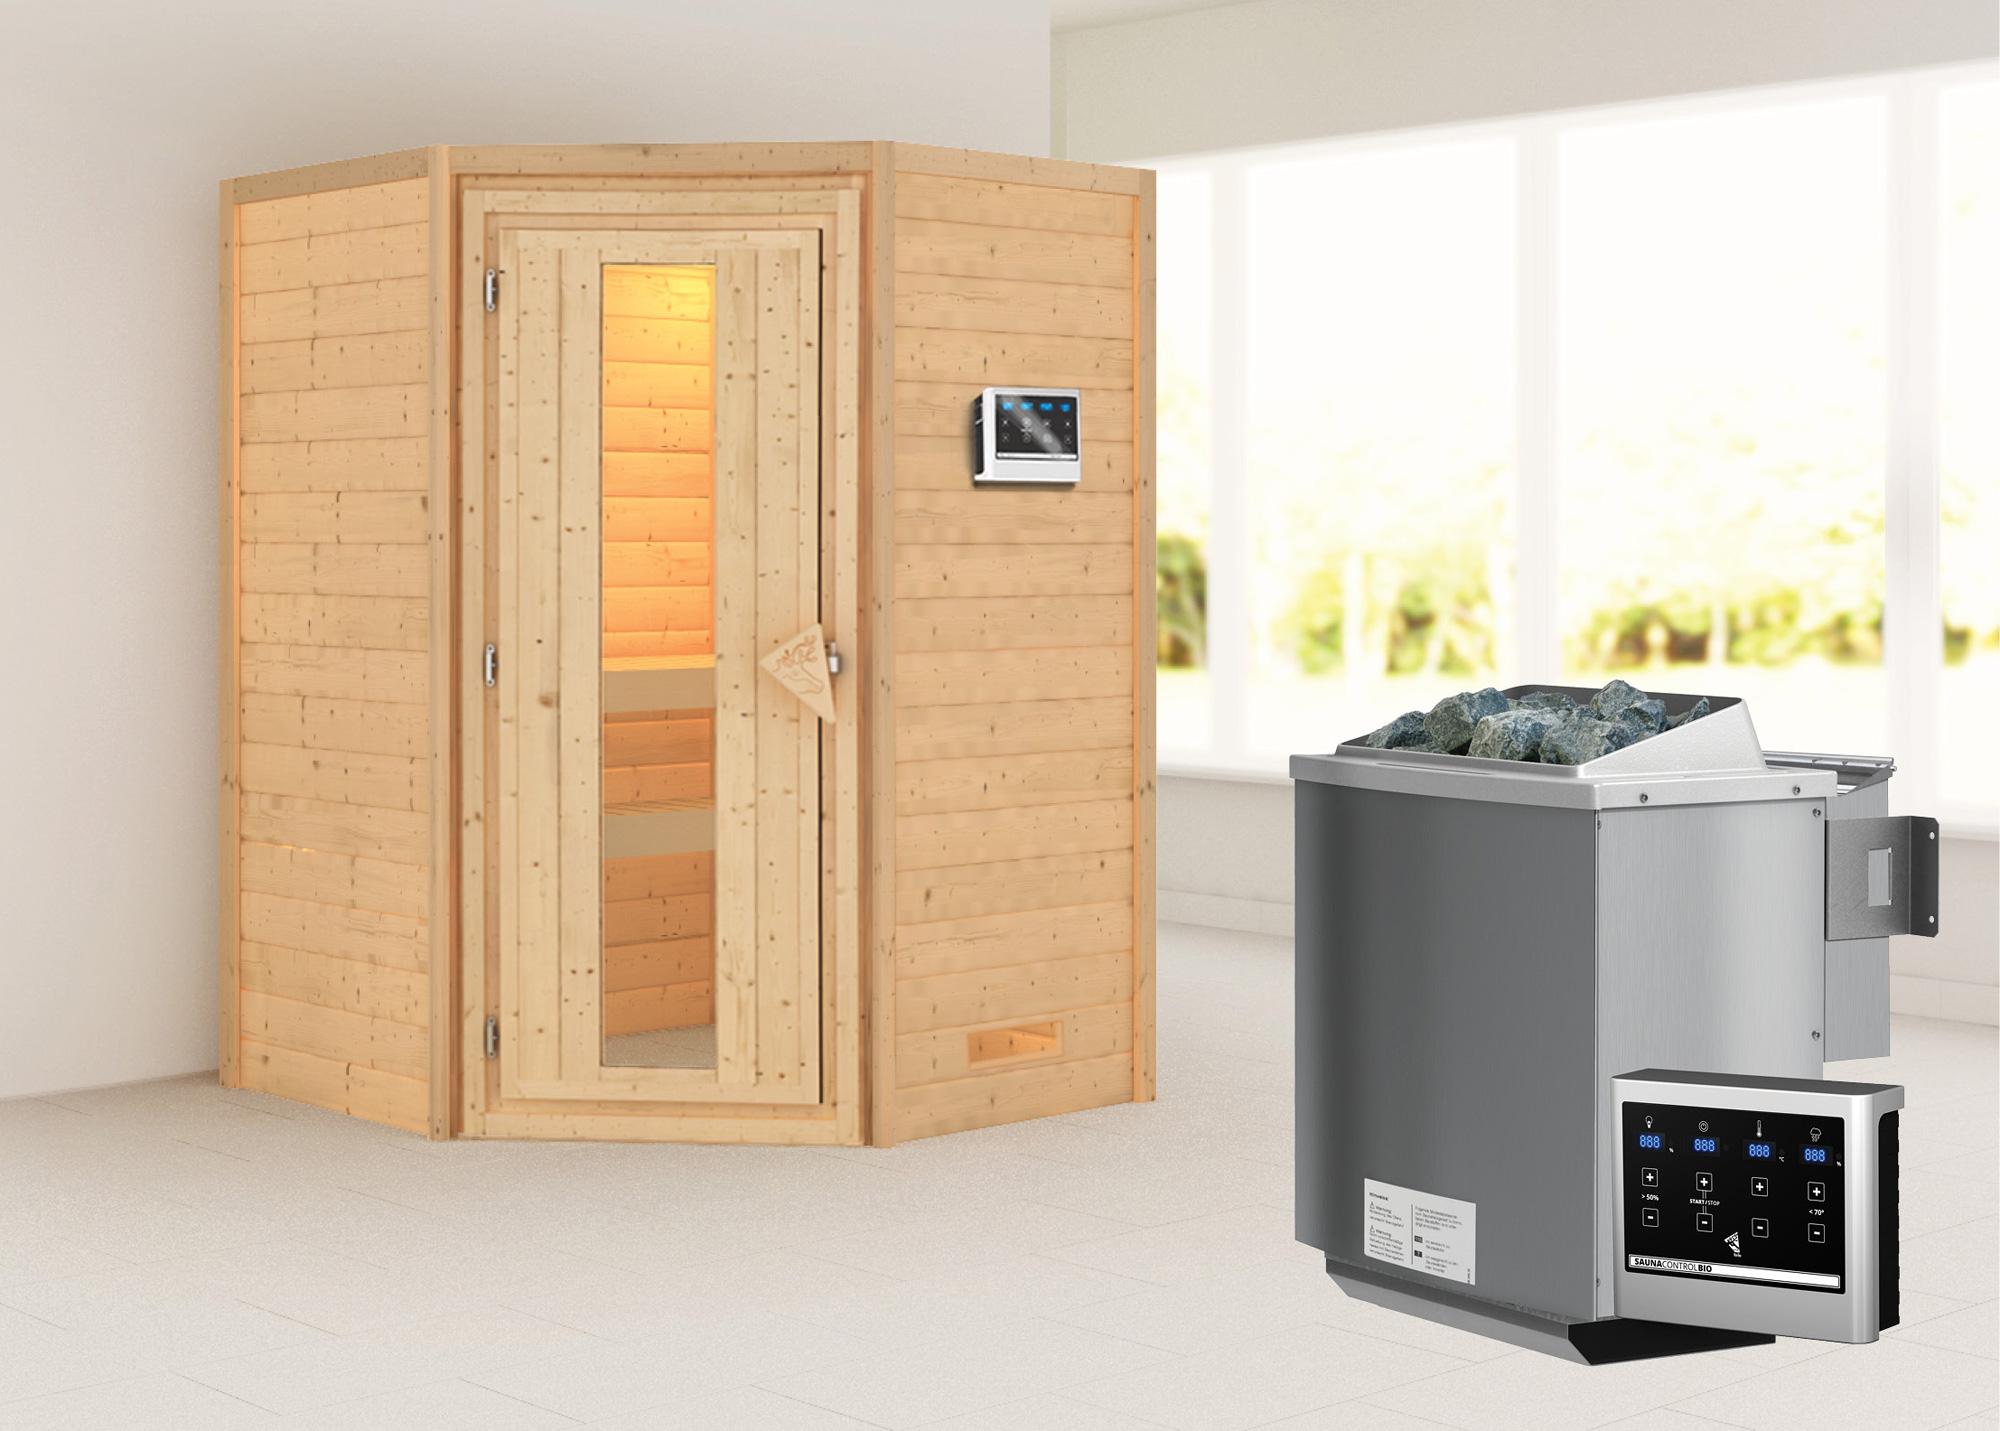 Woodfeeling Sauna Franka 38mm mit Bio Saunaofen 9kW extern Holztür Bild 1